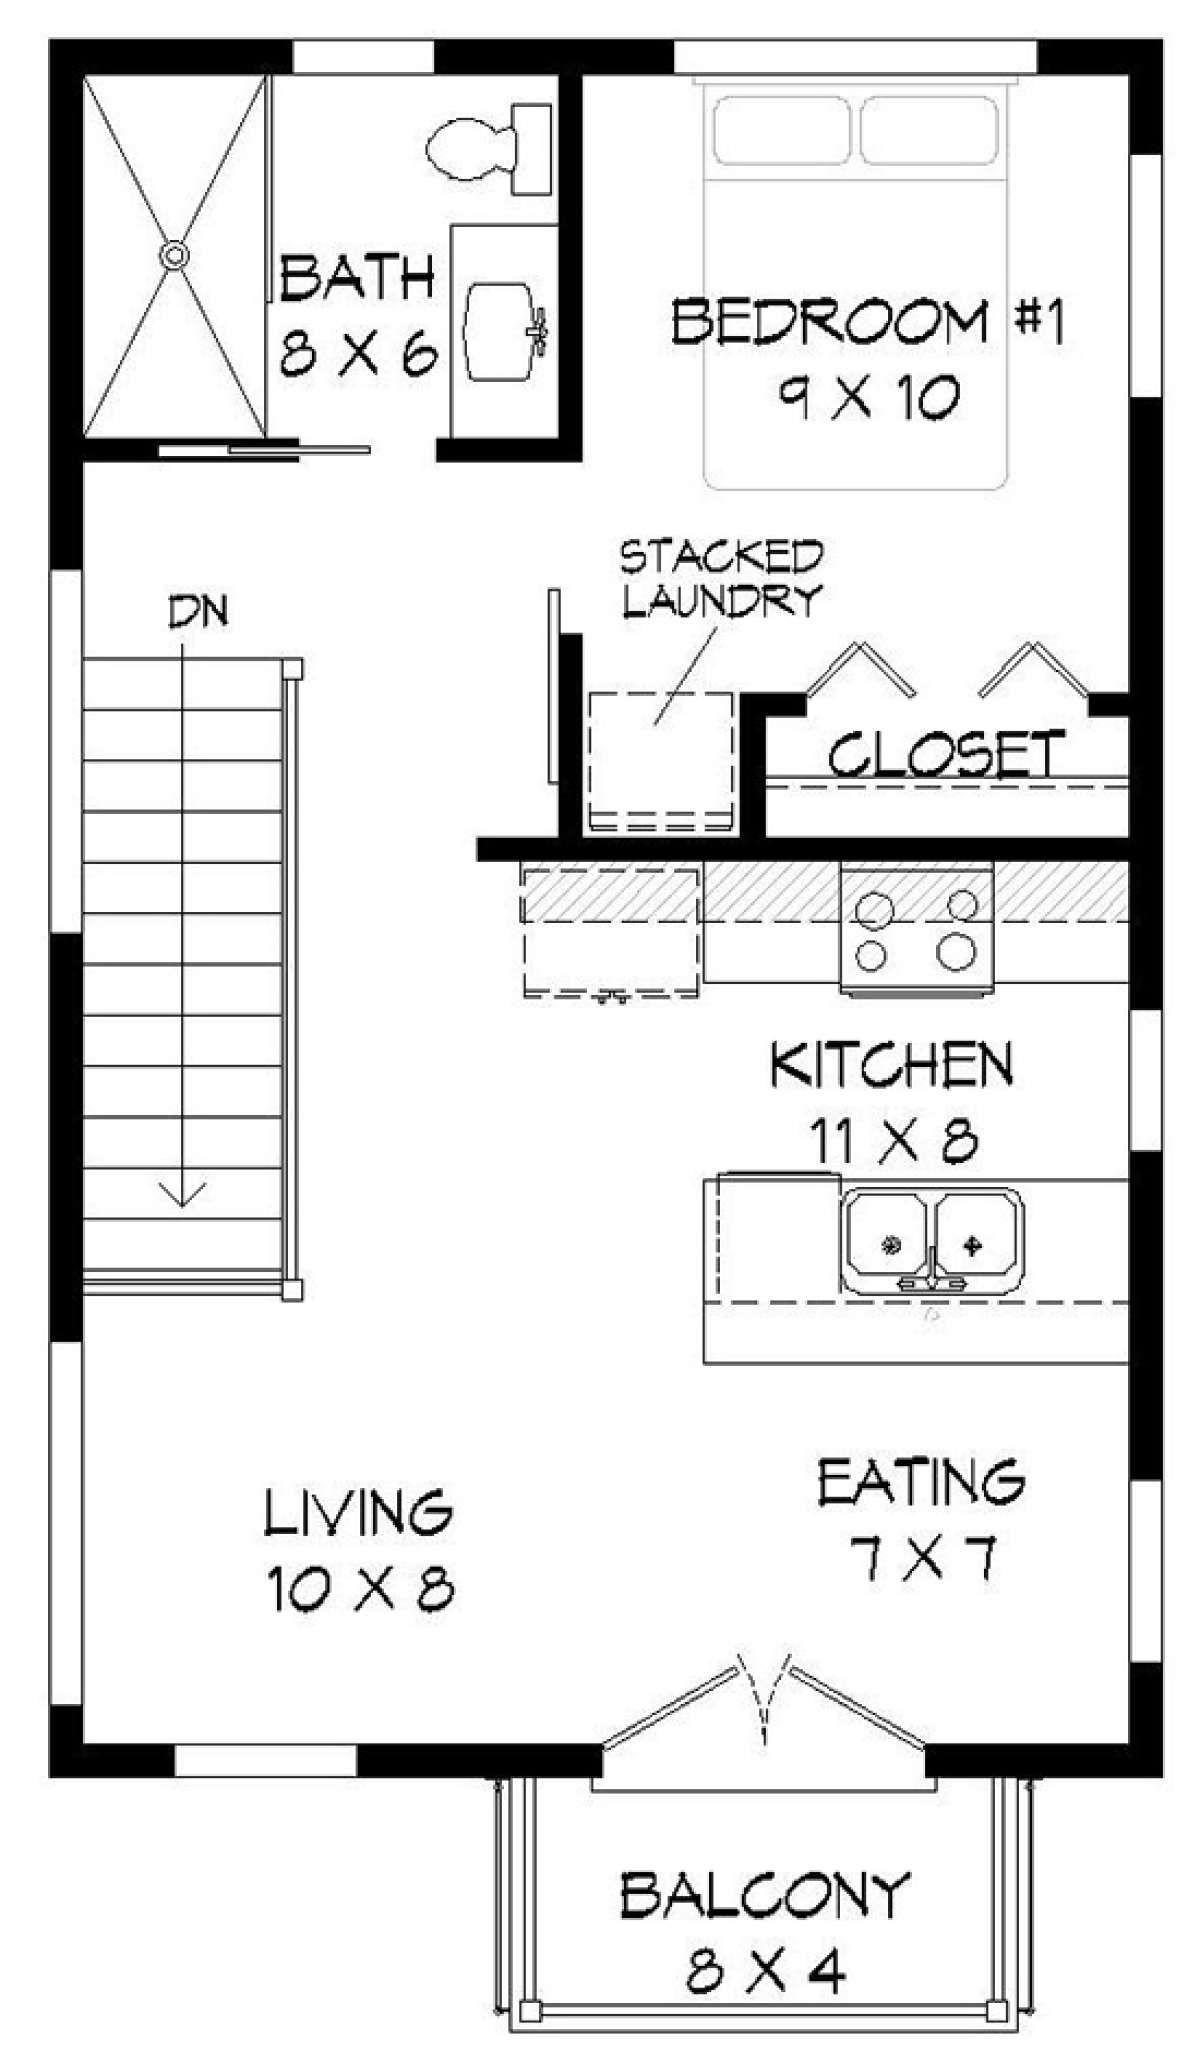 House Plan 940 00042 Modern Plan 572 Square Feet 1 Bedroom 1 Bathroom Carriage House Plans Narrow Lot House Plans Garage Apartment Floor Plans